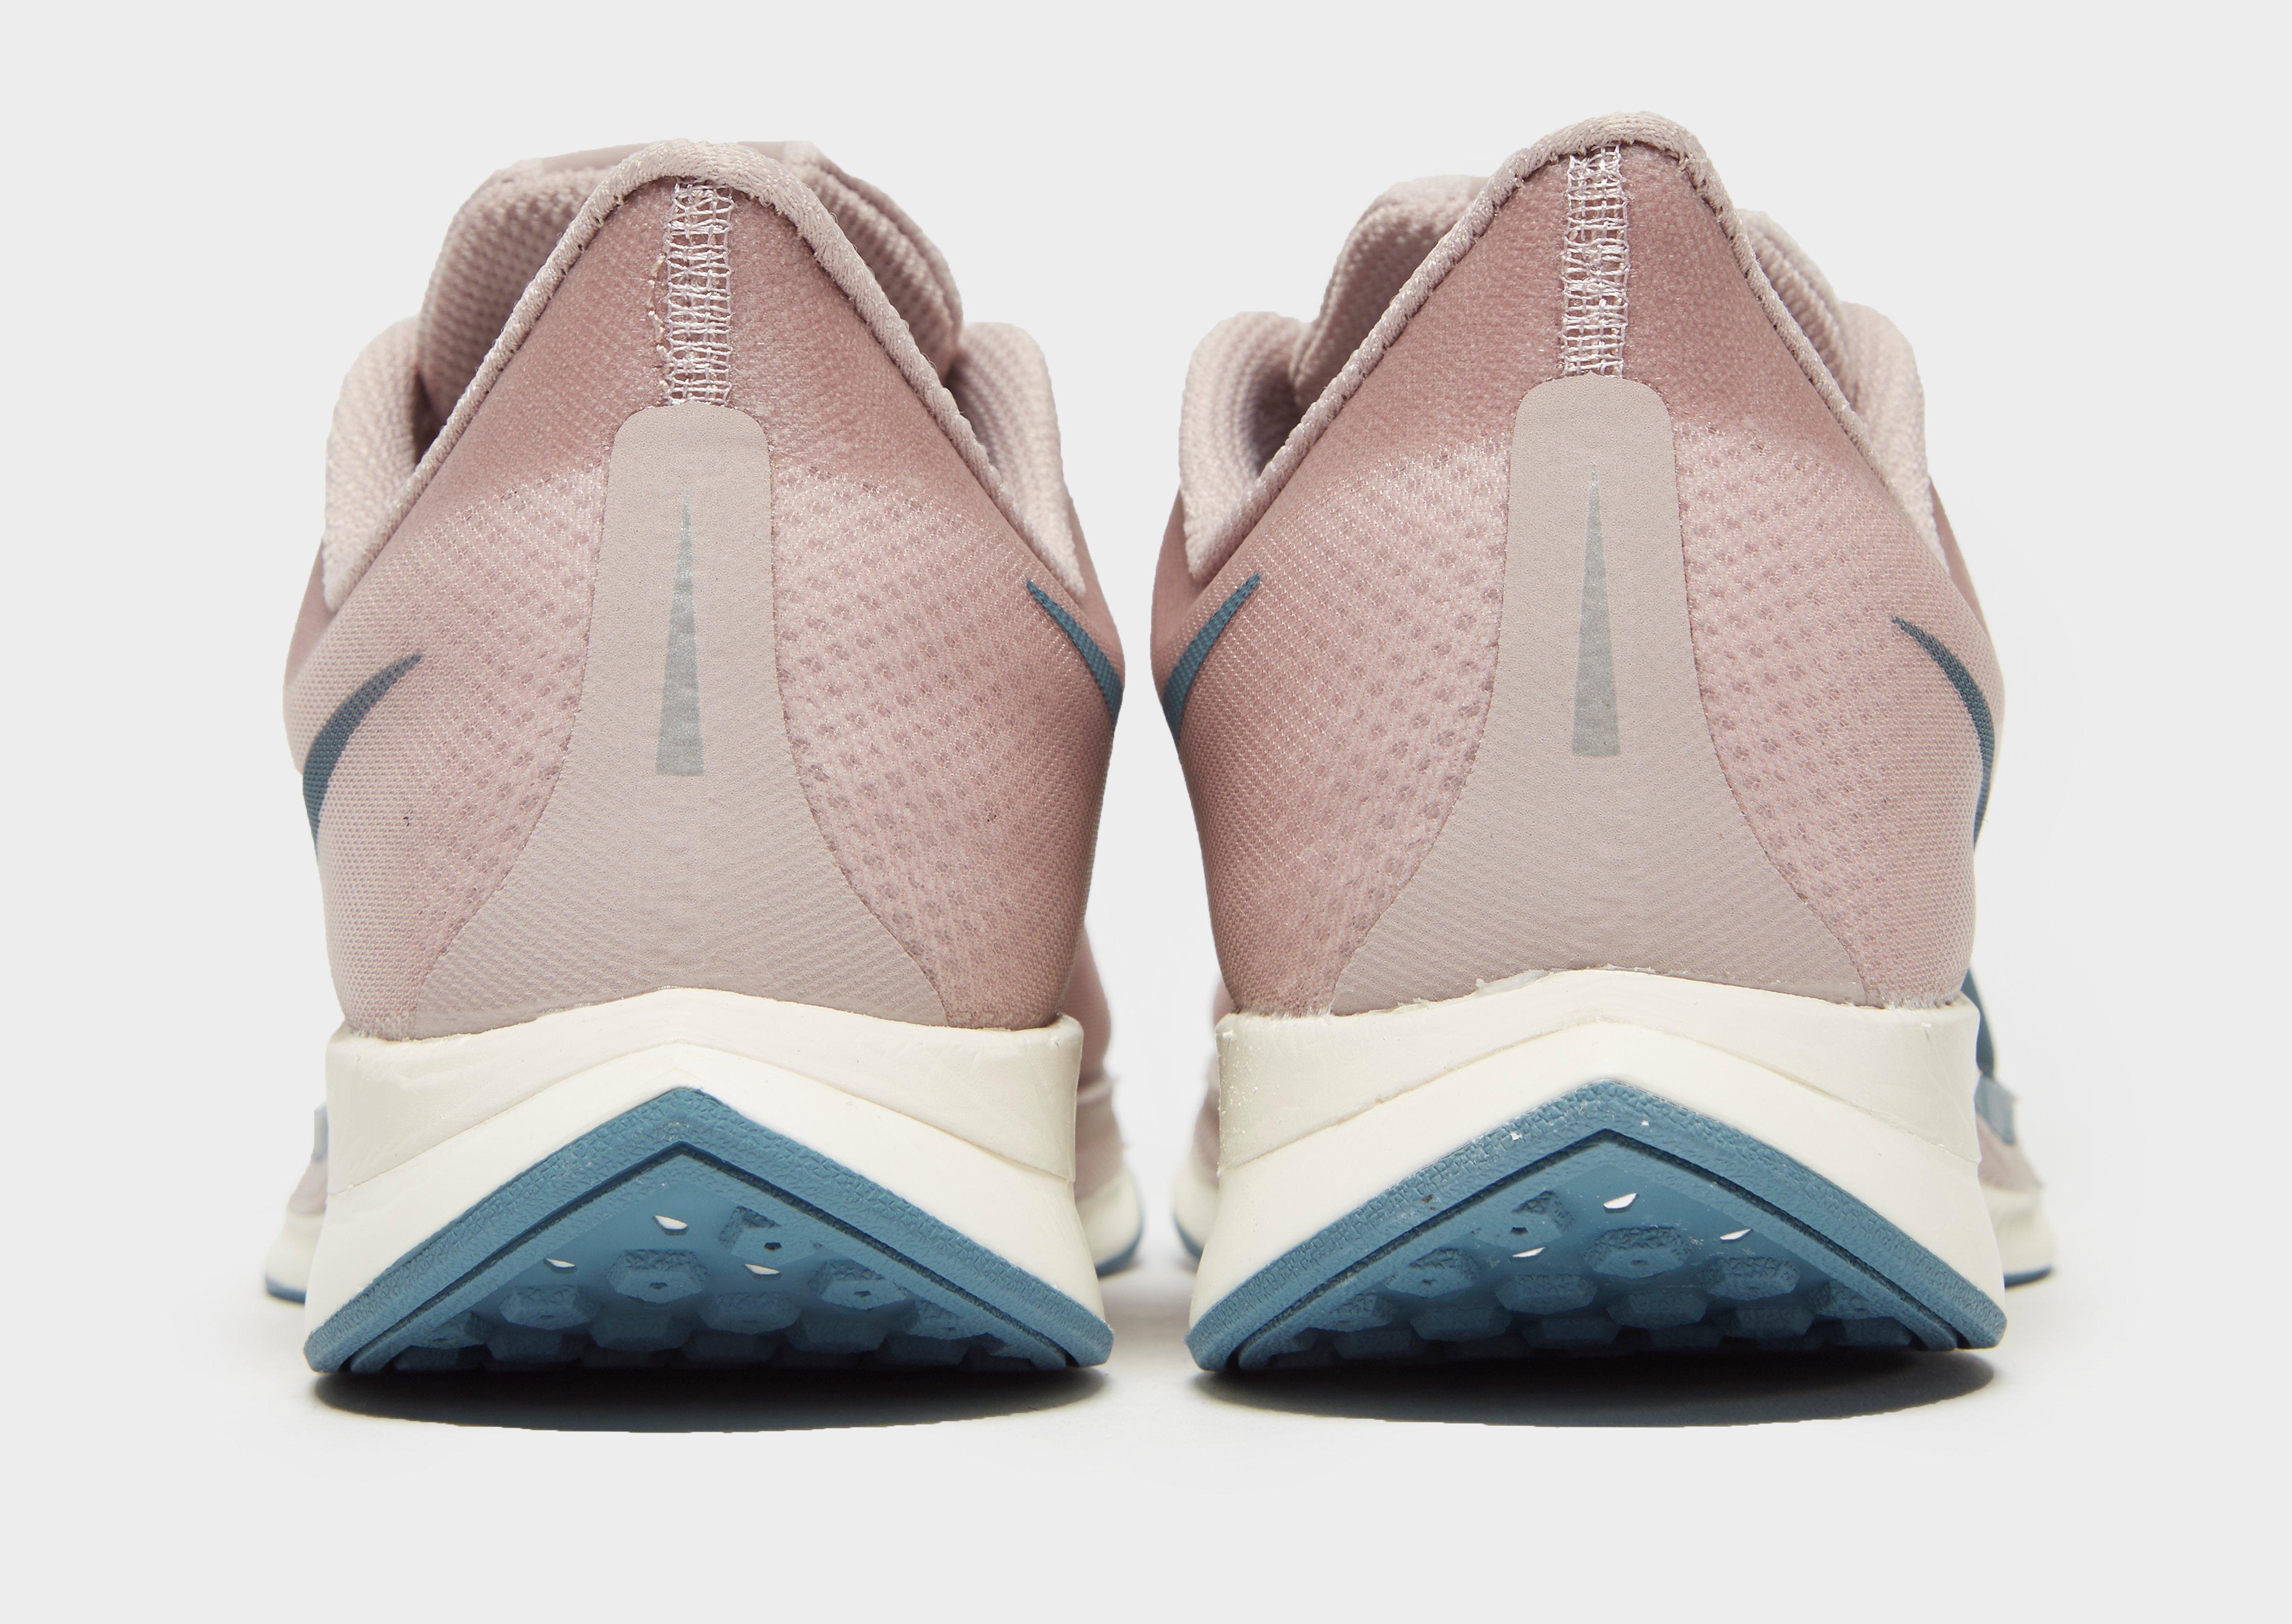 d33a443f71b Nike Air Zoom Pegasus 35 Turbo in Pink - Lyst